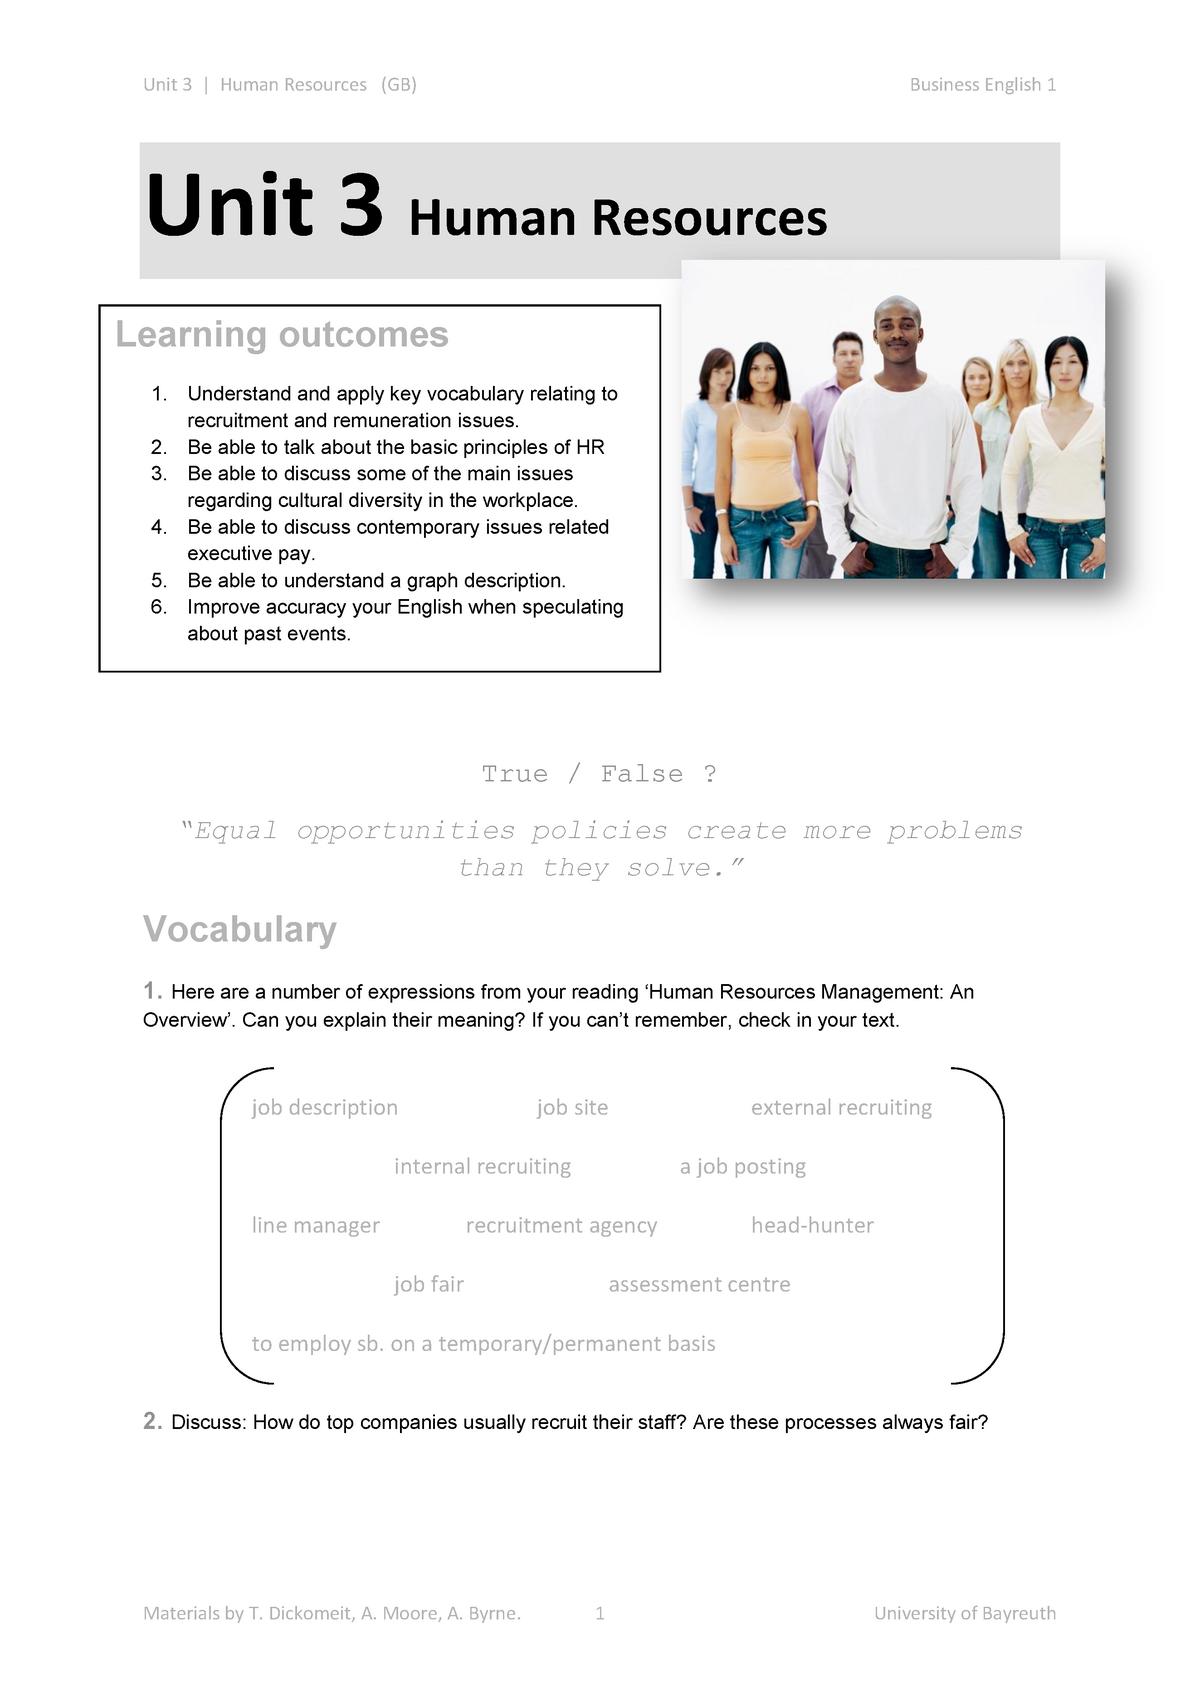 Unit 3 Human Resources V3 - Business English I - StuDocu